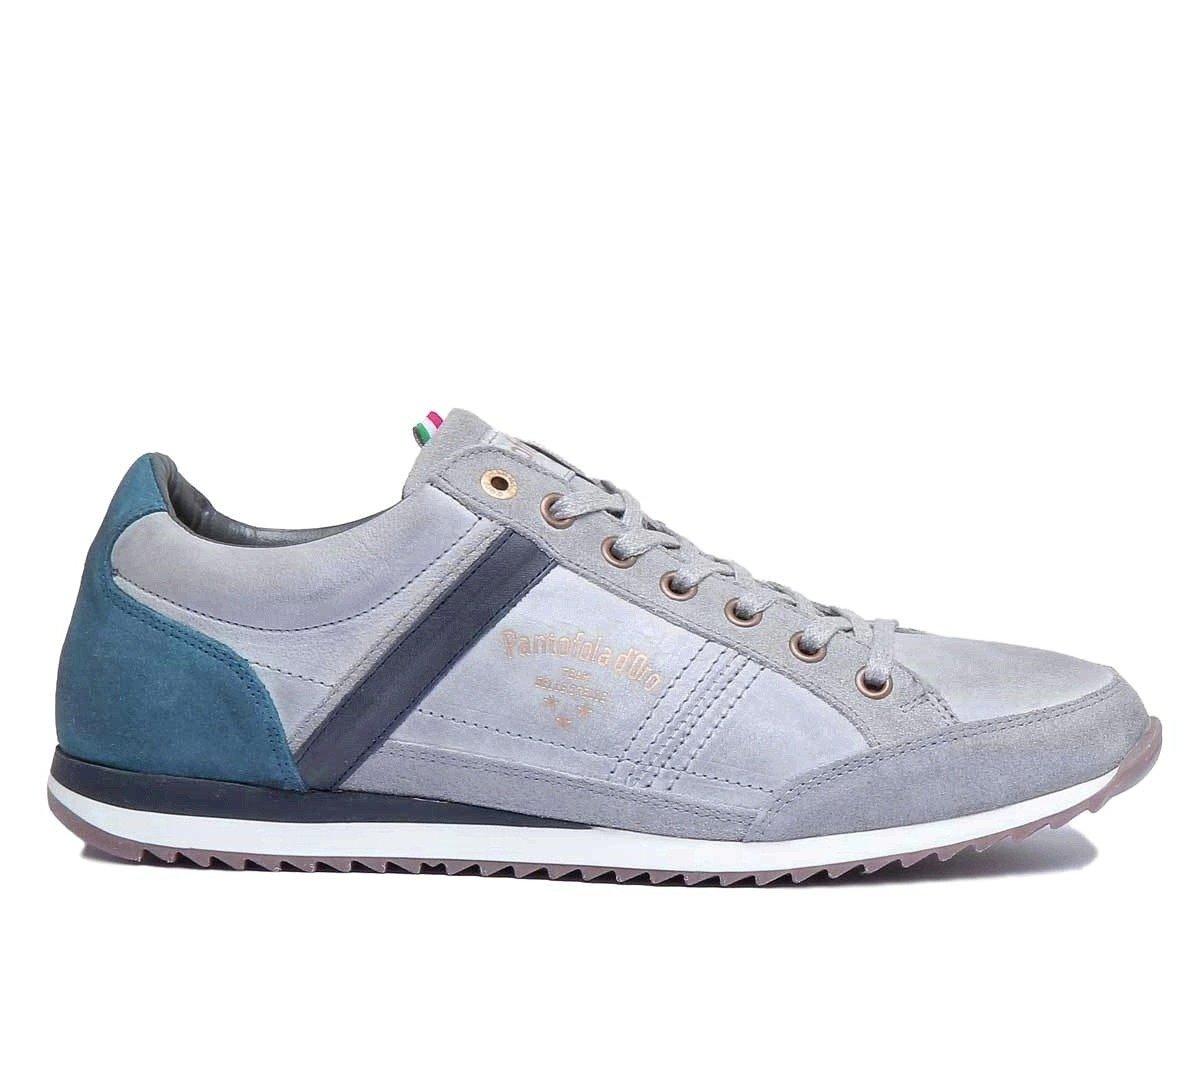 Matera Low Pantofola D´oro Schuhe Shoes Sneaker Herren Men Uomo Grau UMVzSpq